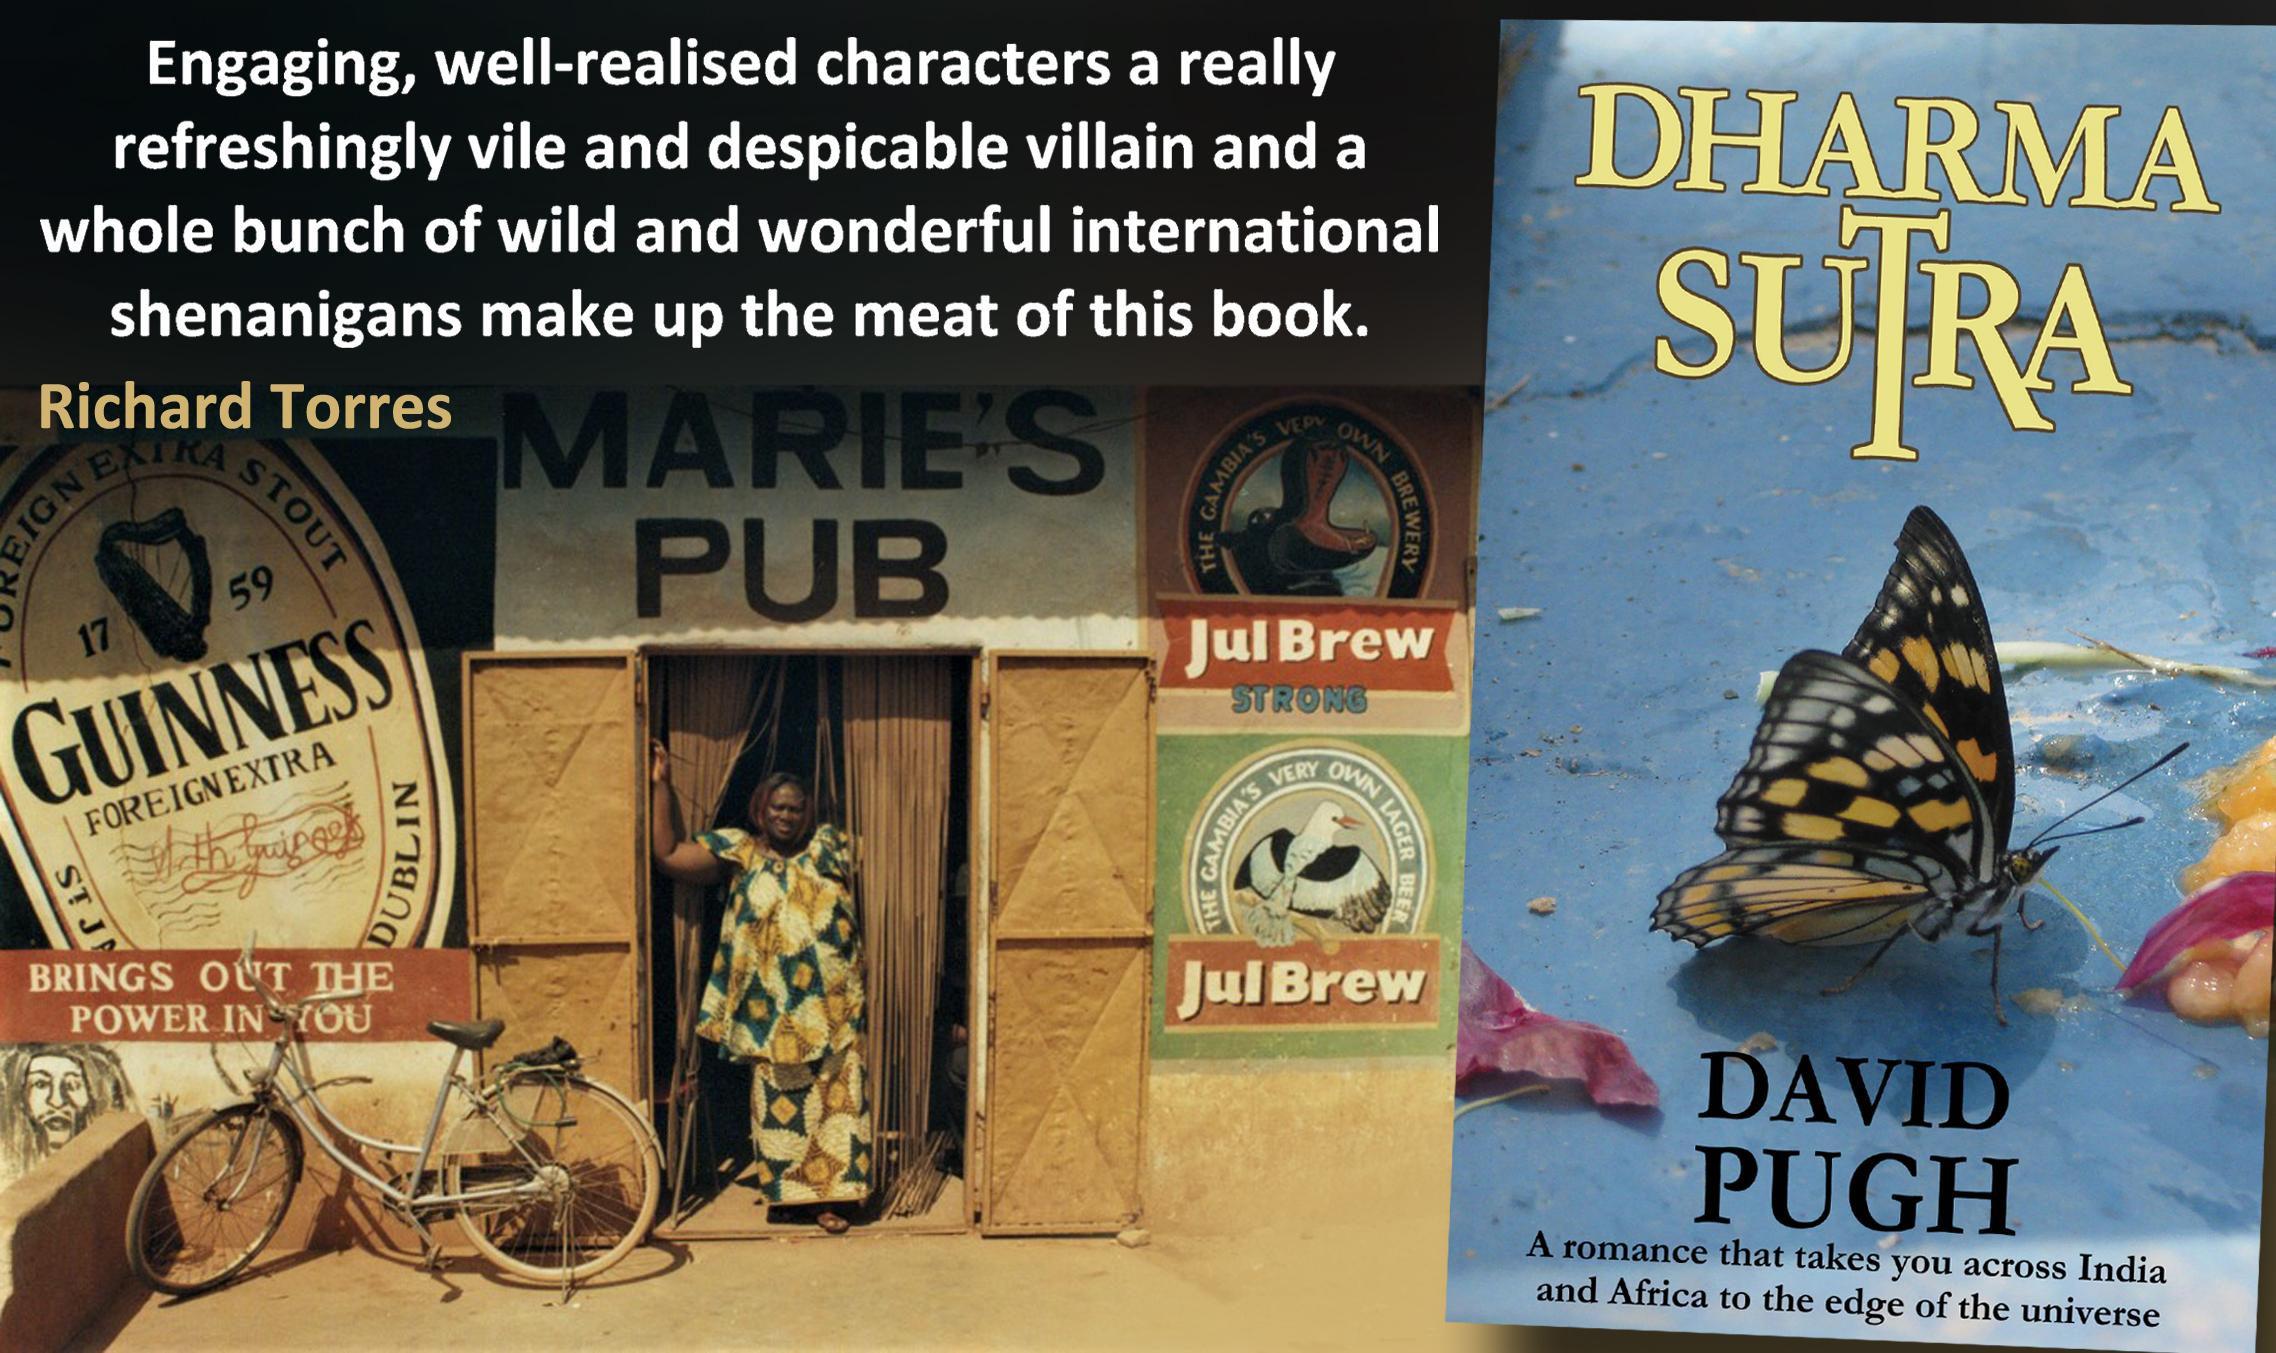 Dharma Sutra by David Pugh